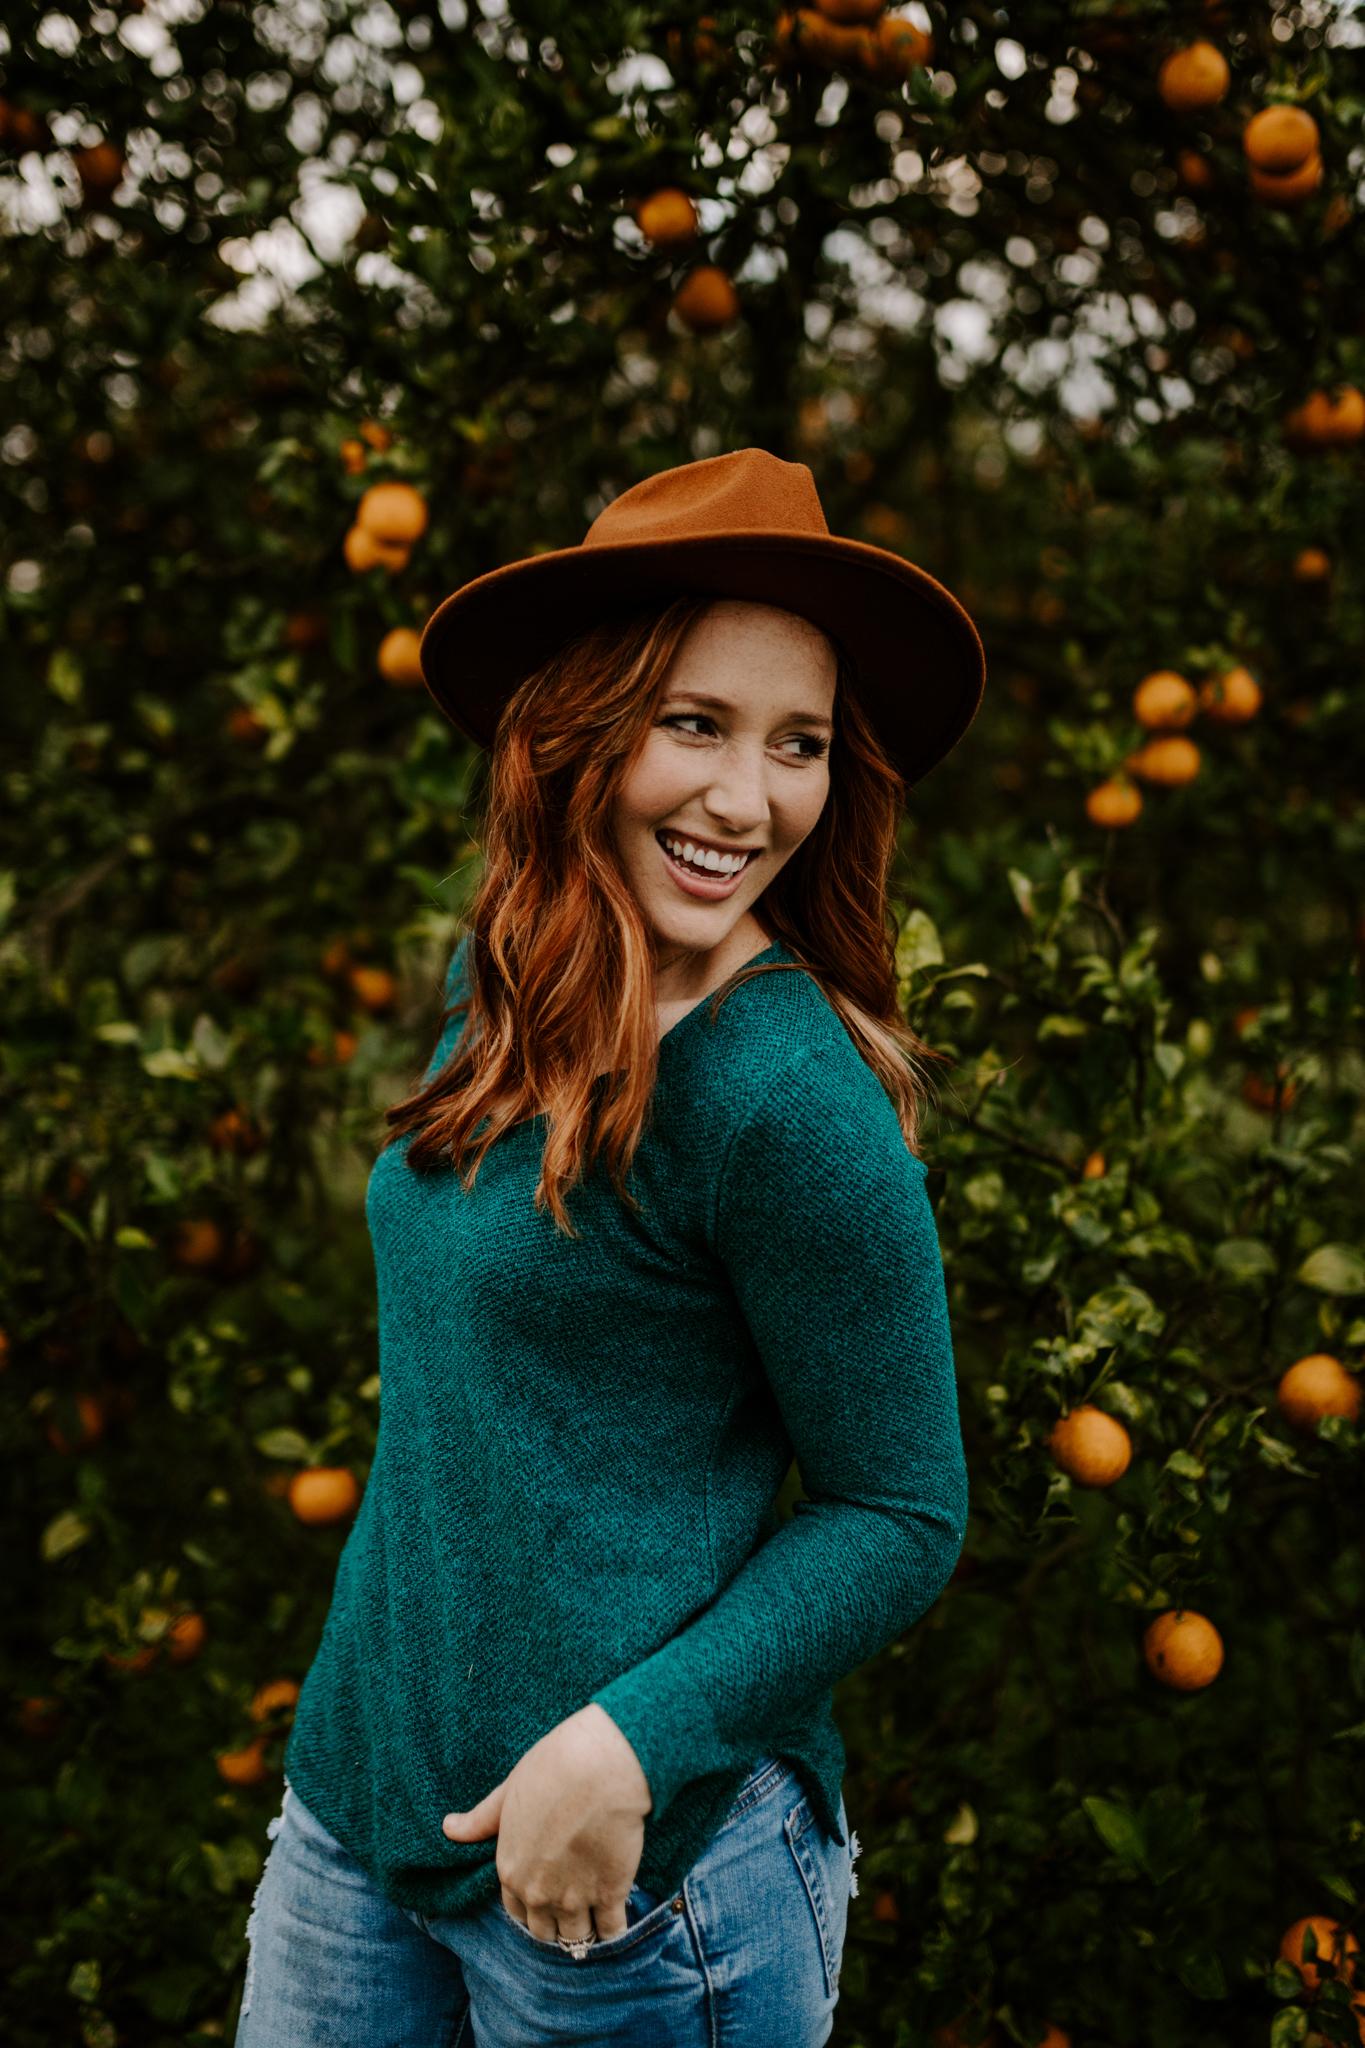 Jessica Jones Photography - Wedding Photographer